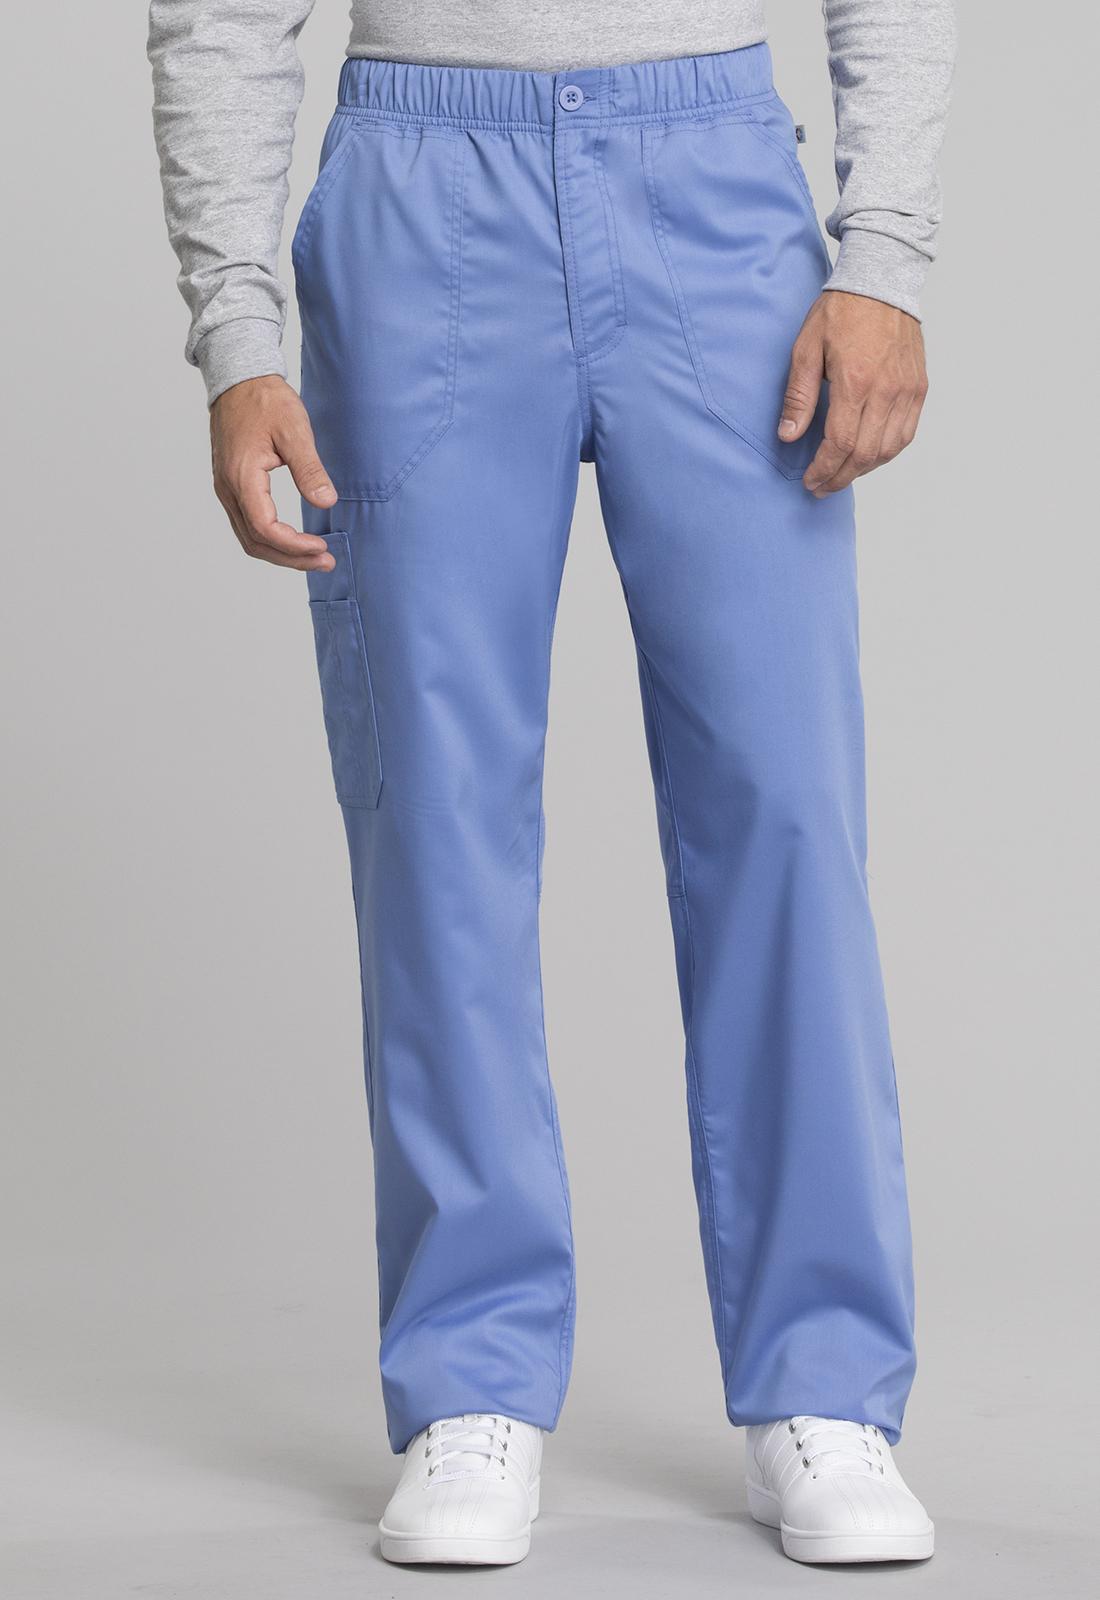 Men's Mid Rise Straight Leg Zip Fly Pant